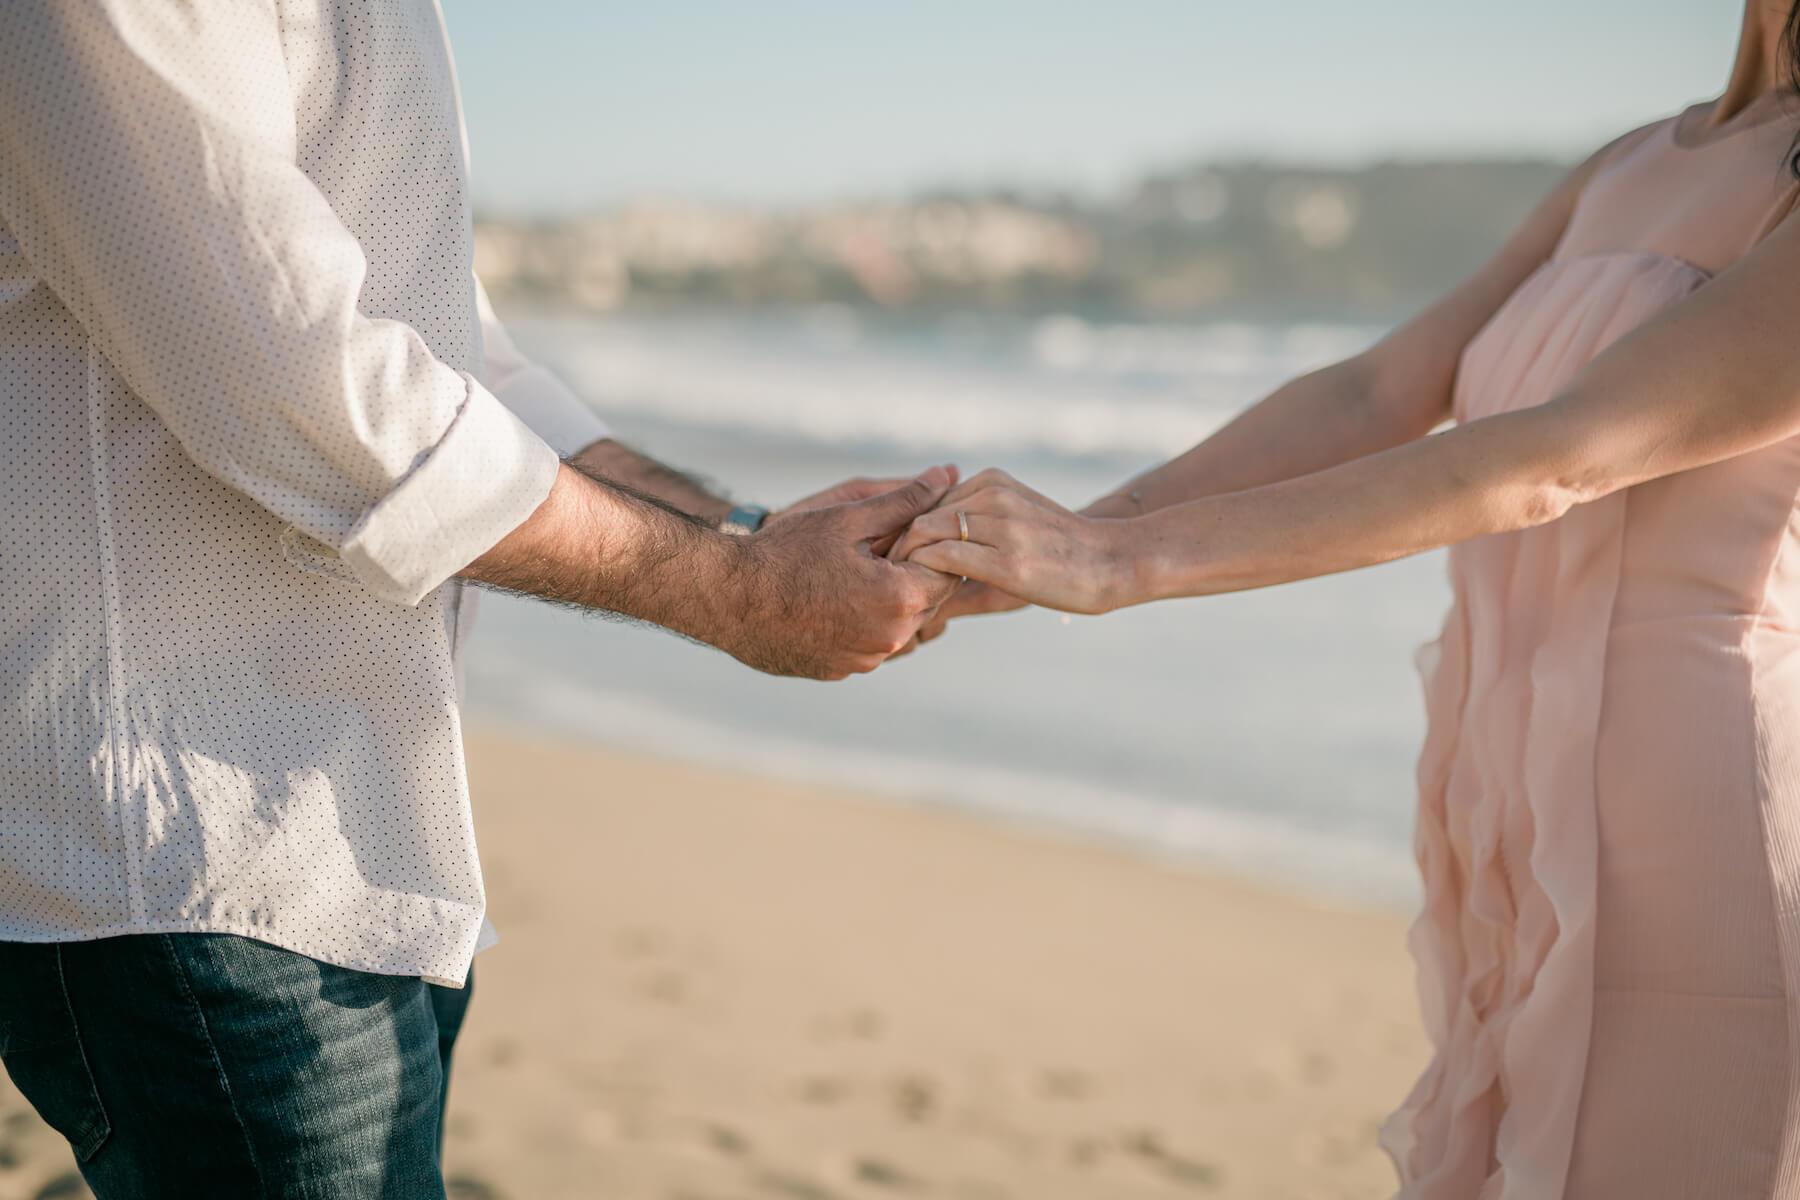 san-francisco-07-12-2020-couples-trip-35_original